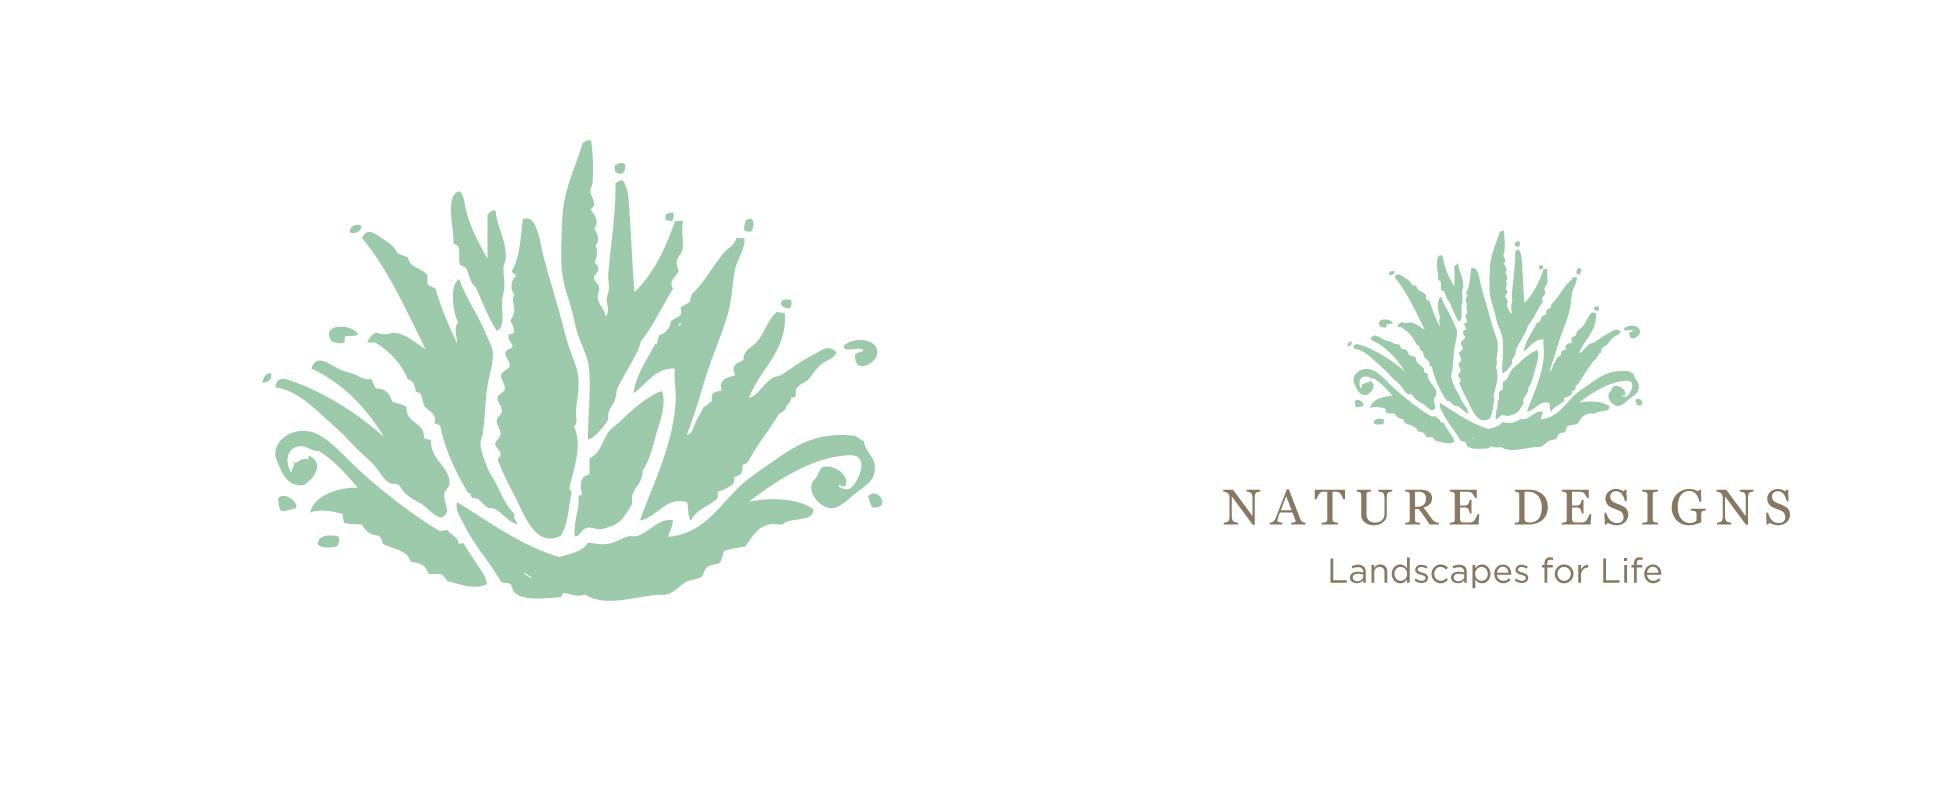 Nature_designs-01.jpg